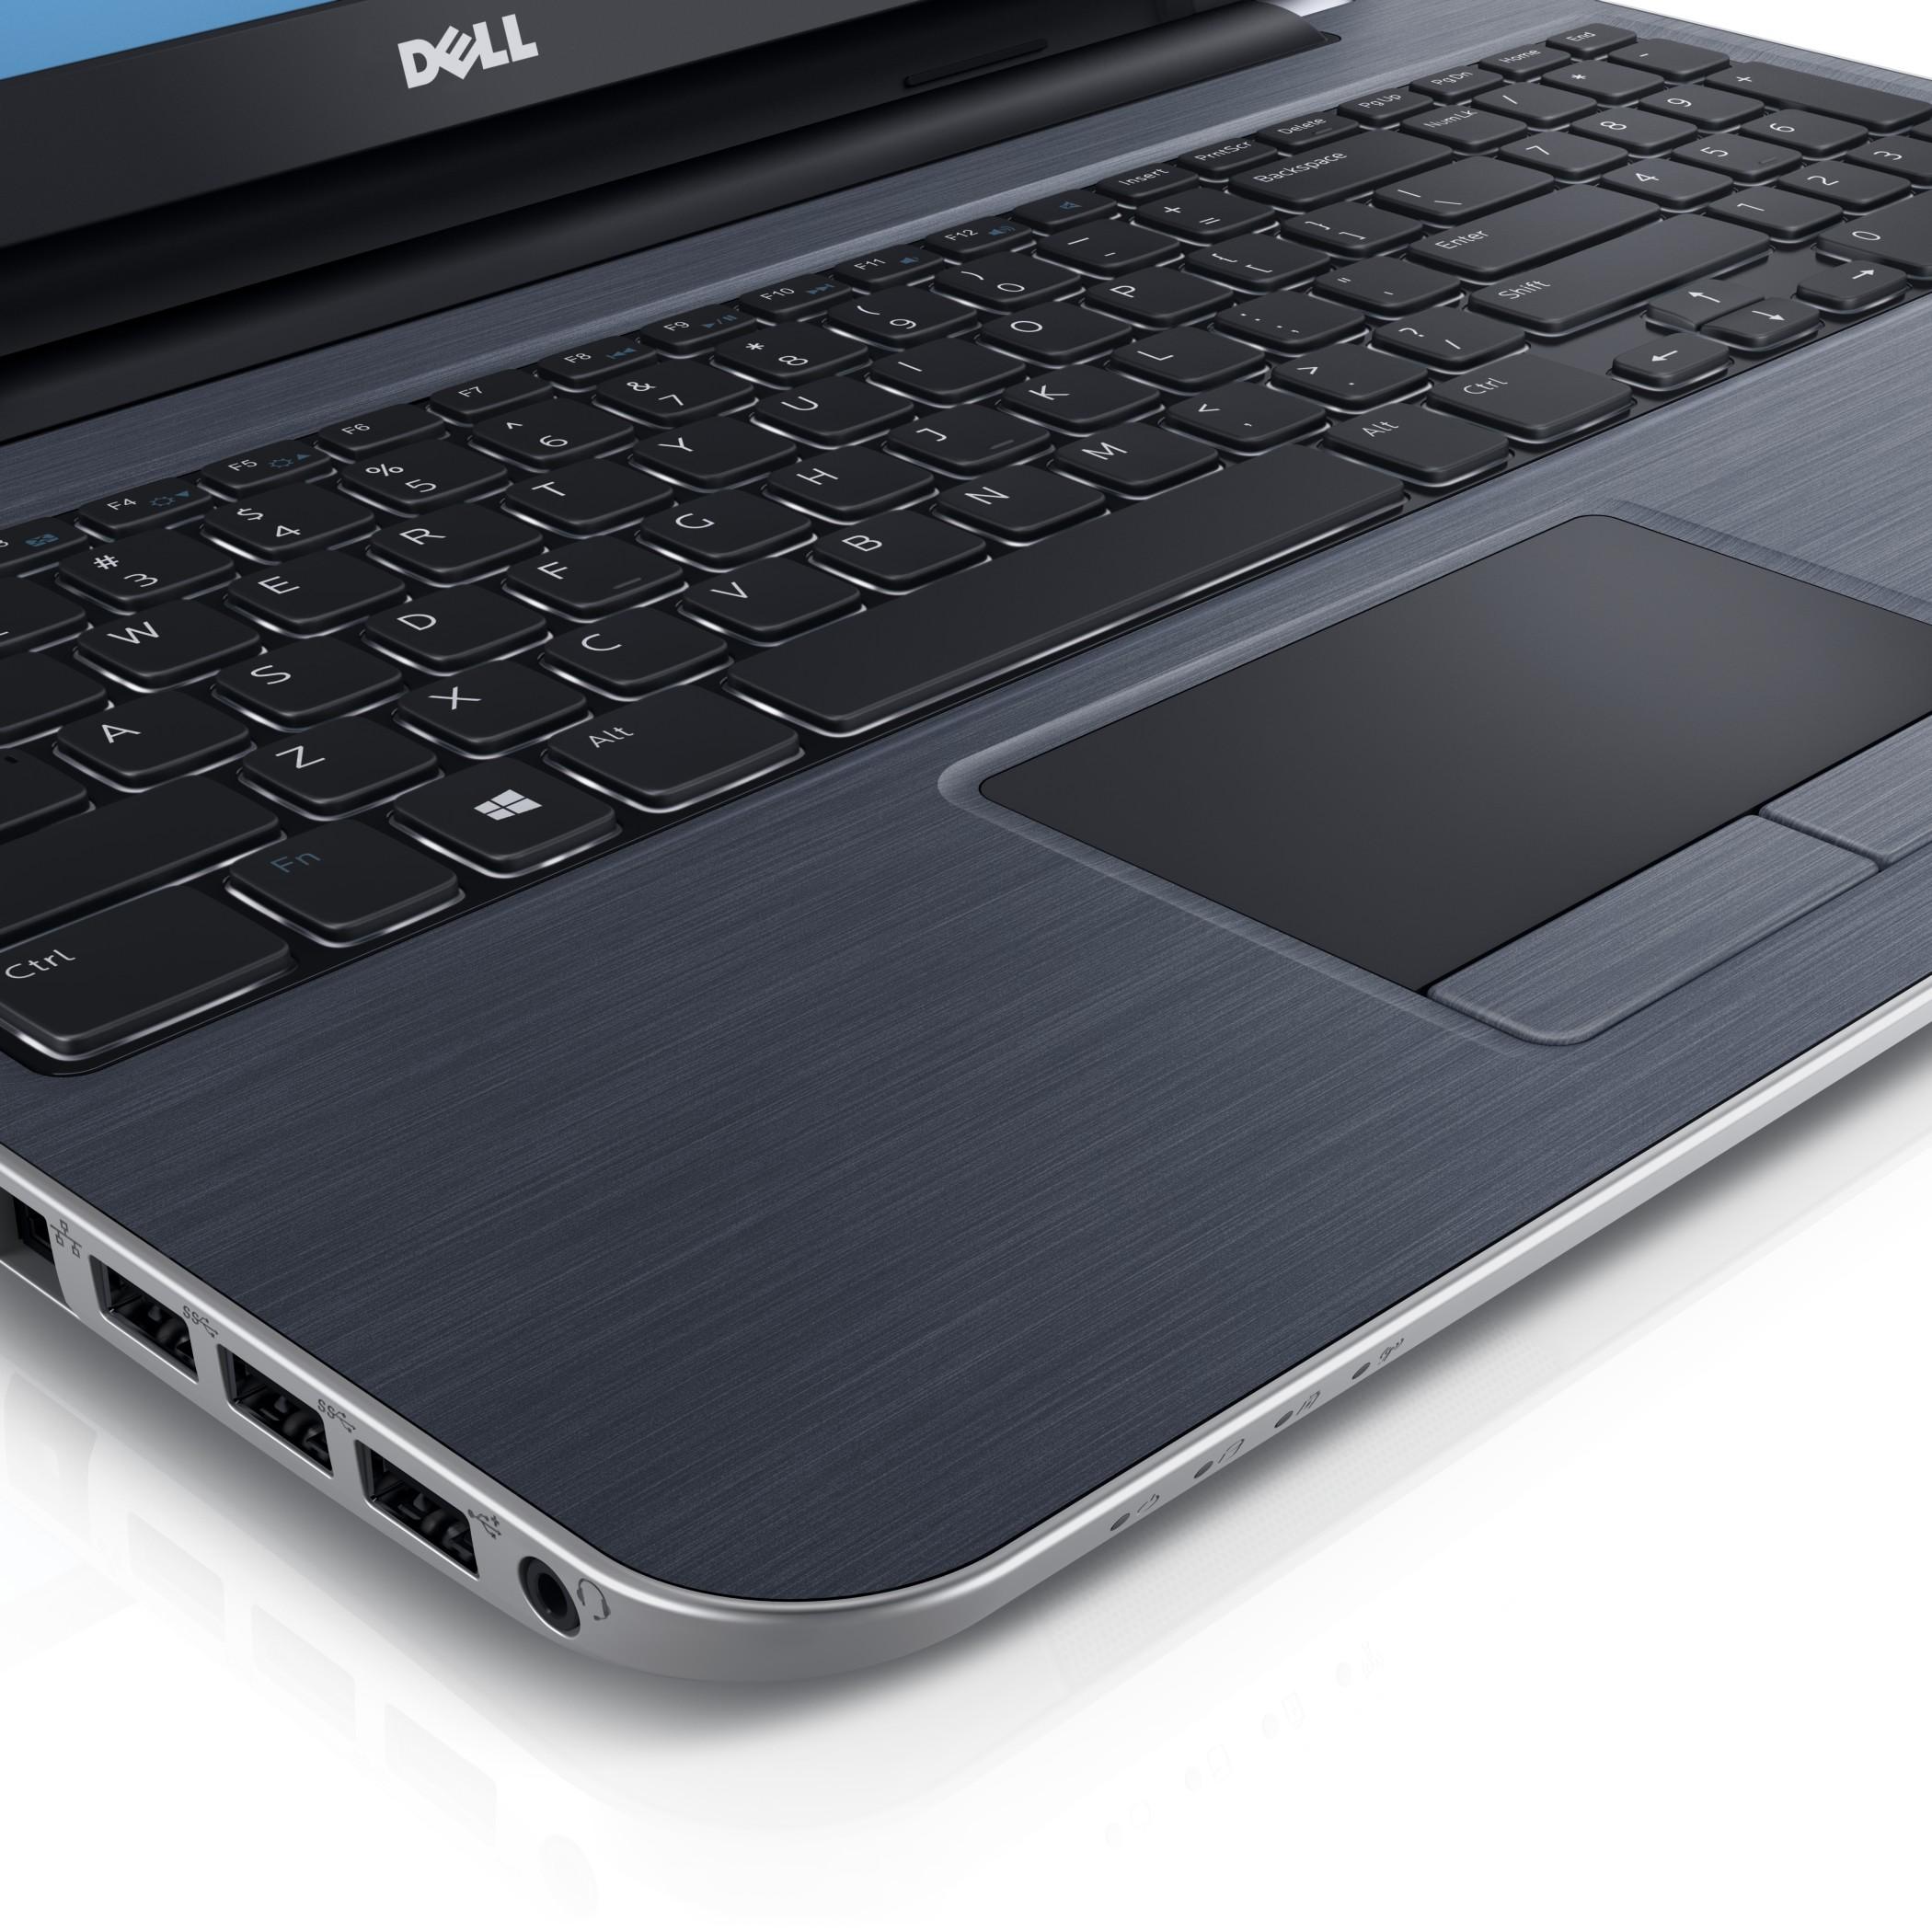 "M: Dell Inspiron 15R 15.6"" LED WXGA HD Slim Dell inspiron 15r photos"